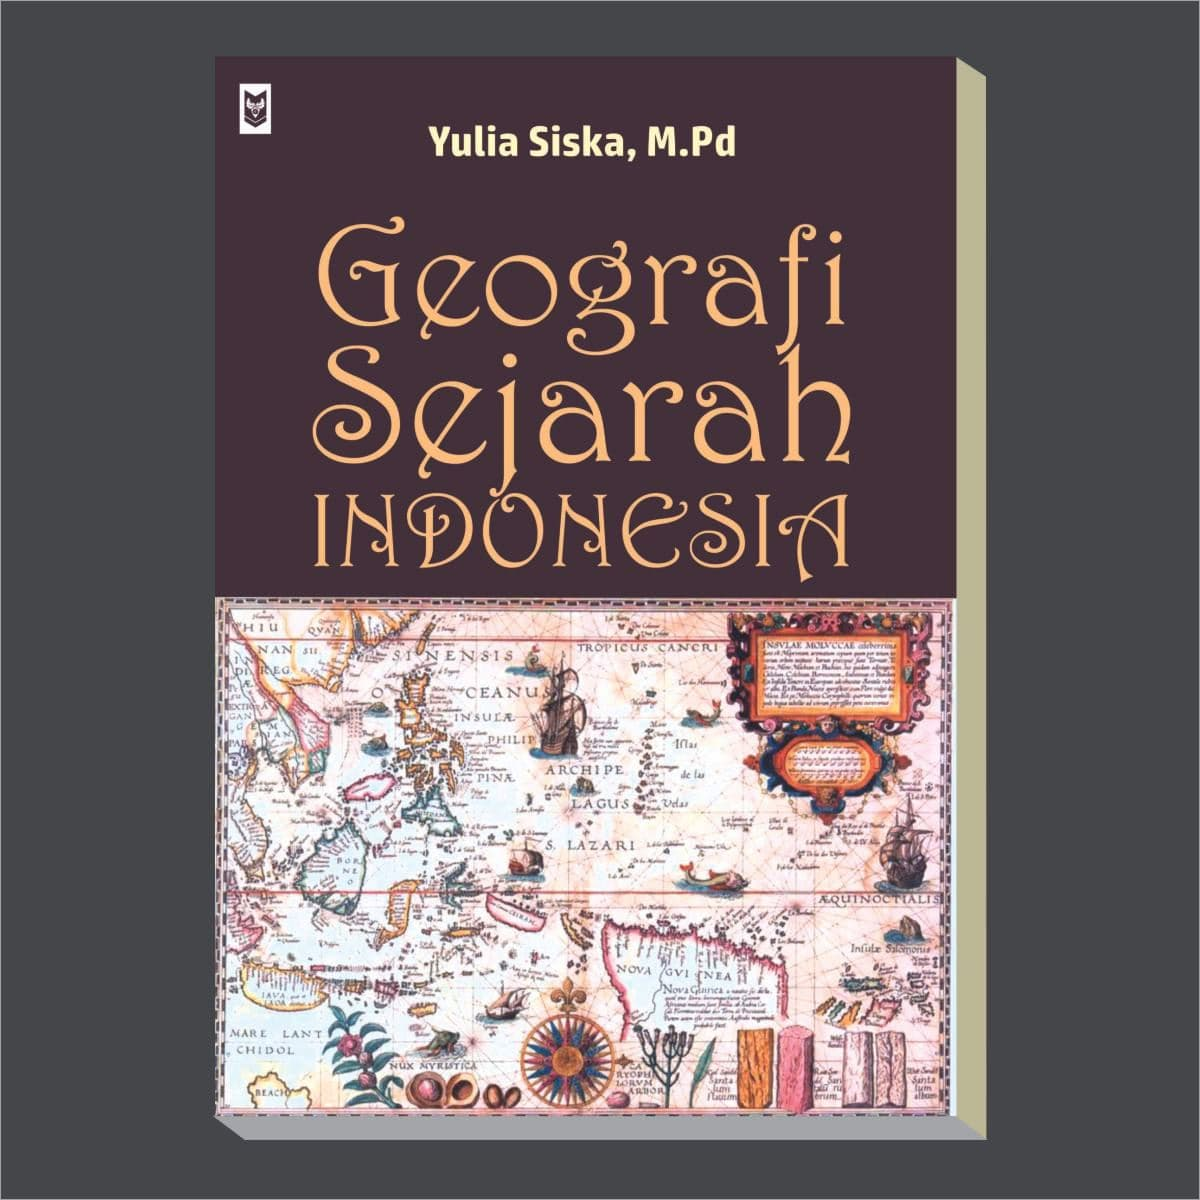 Geografi Sejarah Indonesia - Blanja.com